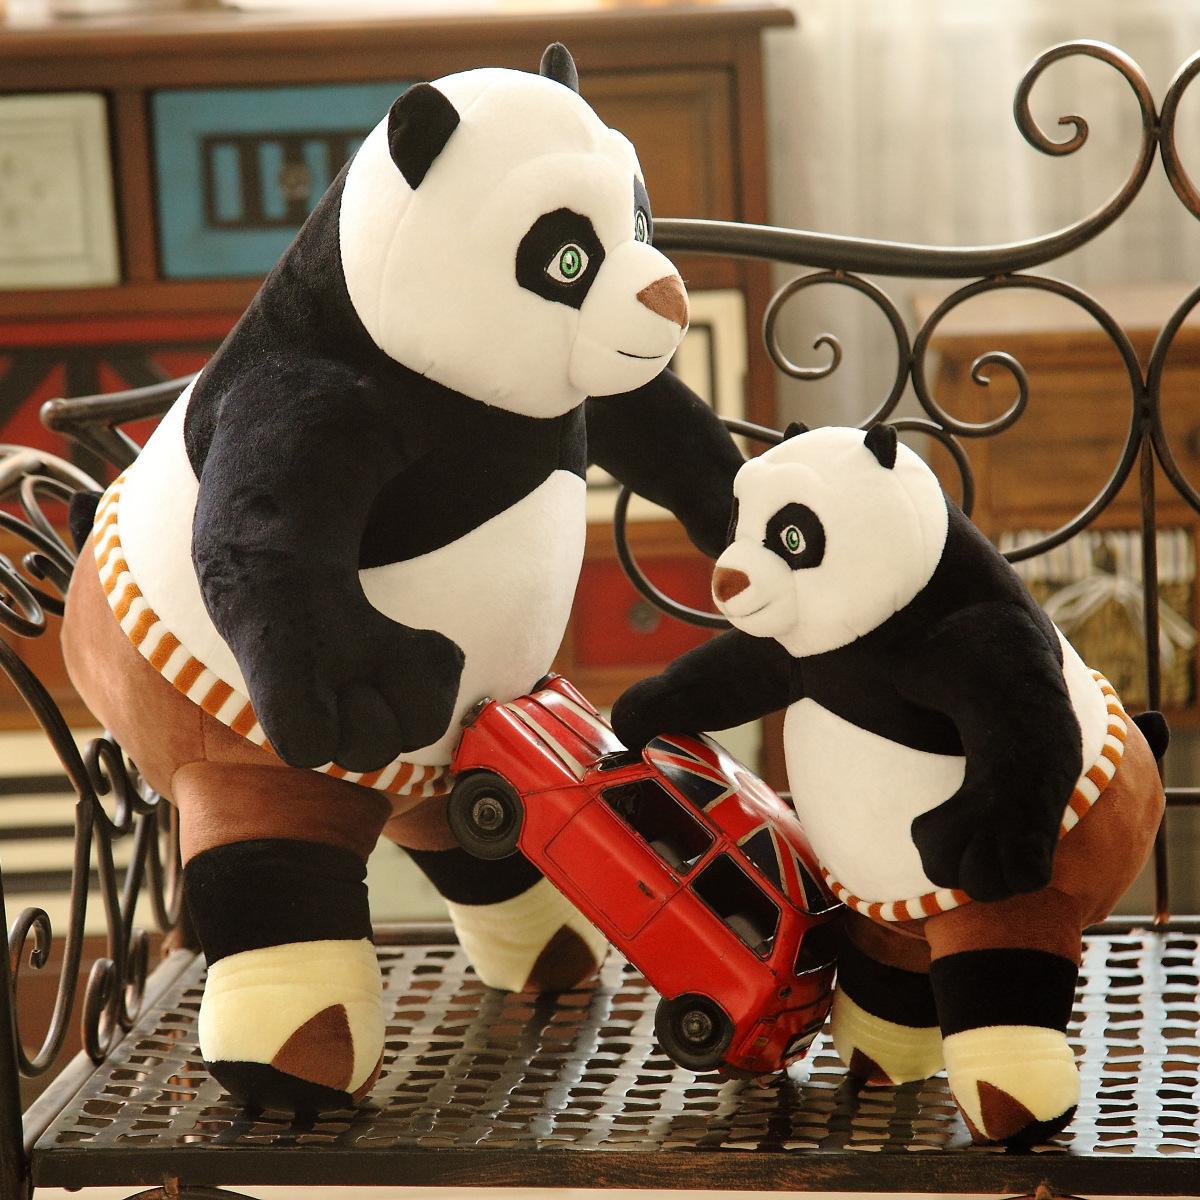 Kung fu panda Po of legendary figures large 50 cm plush toys children gift birthday gift Huge Stuffed Animal Giant Teddy Bears<br><br>Aliexpress